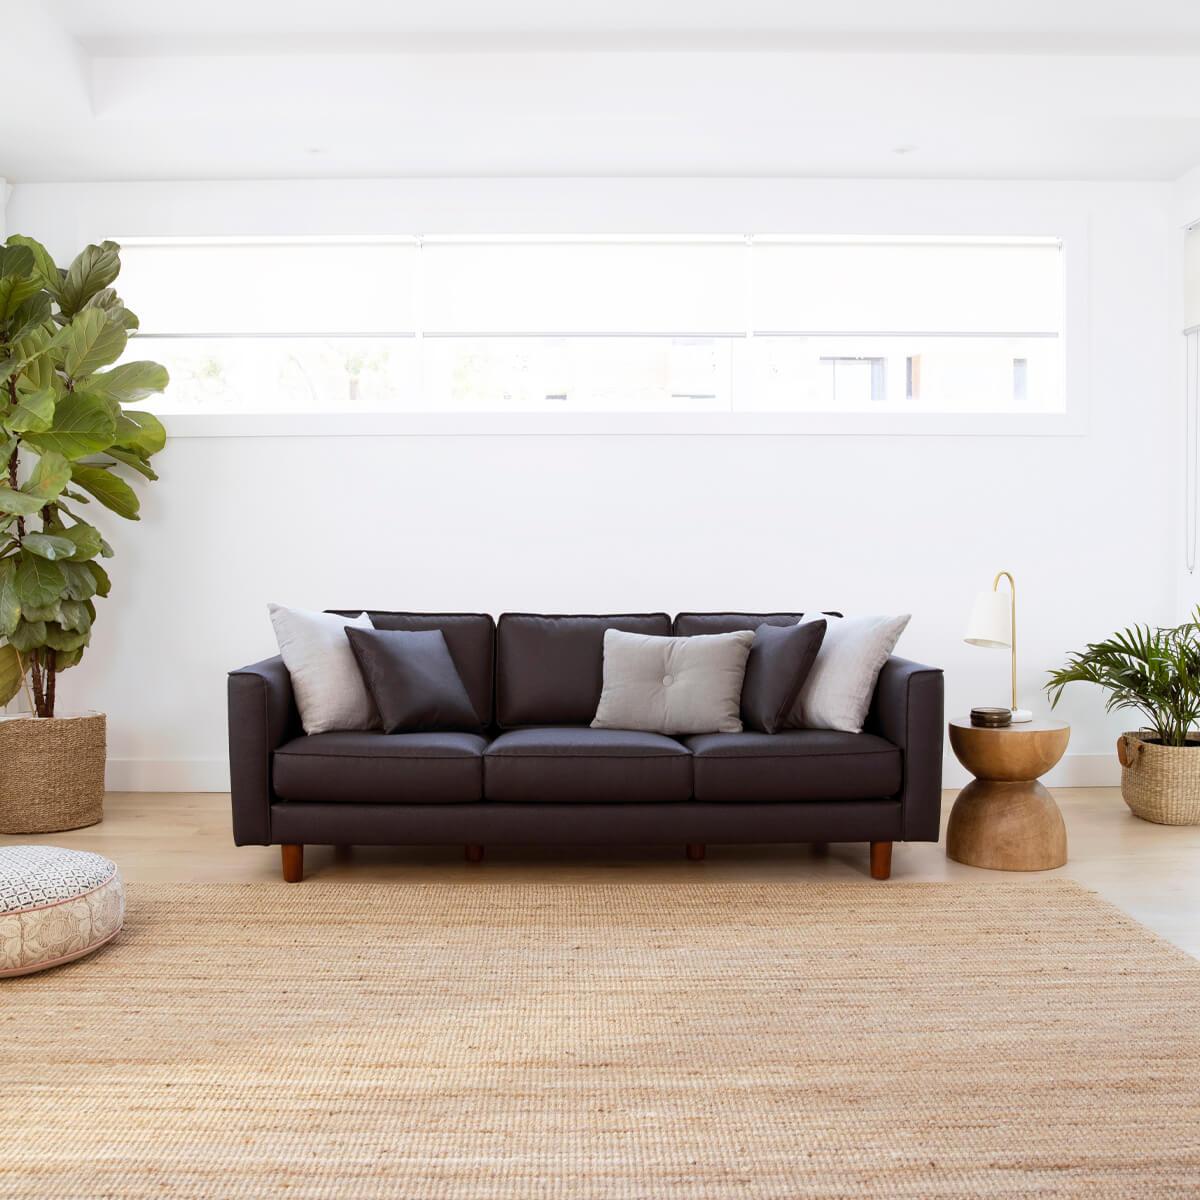 Koala's Cork Leather Sofa in Jenolan Black